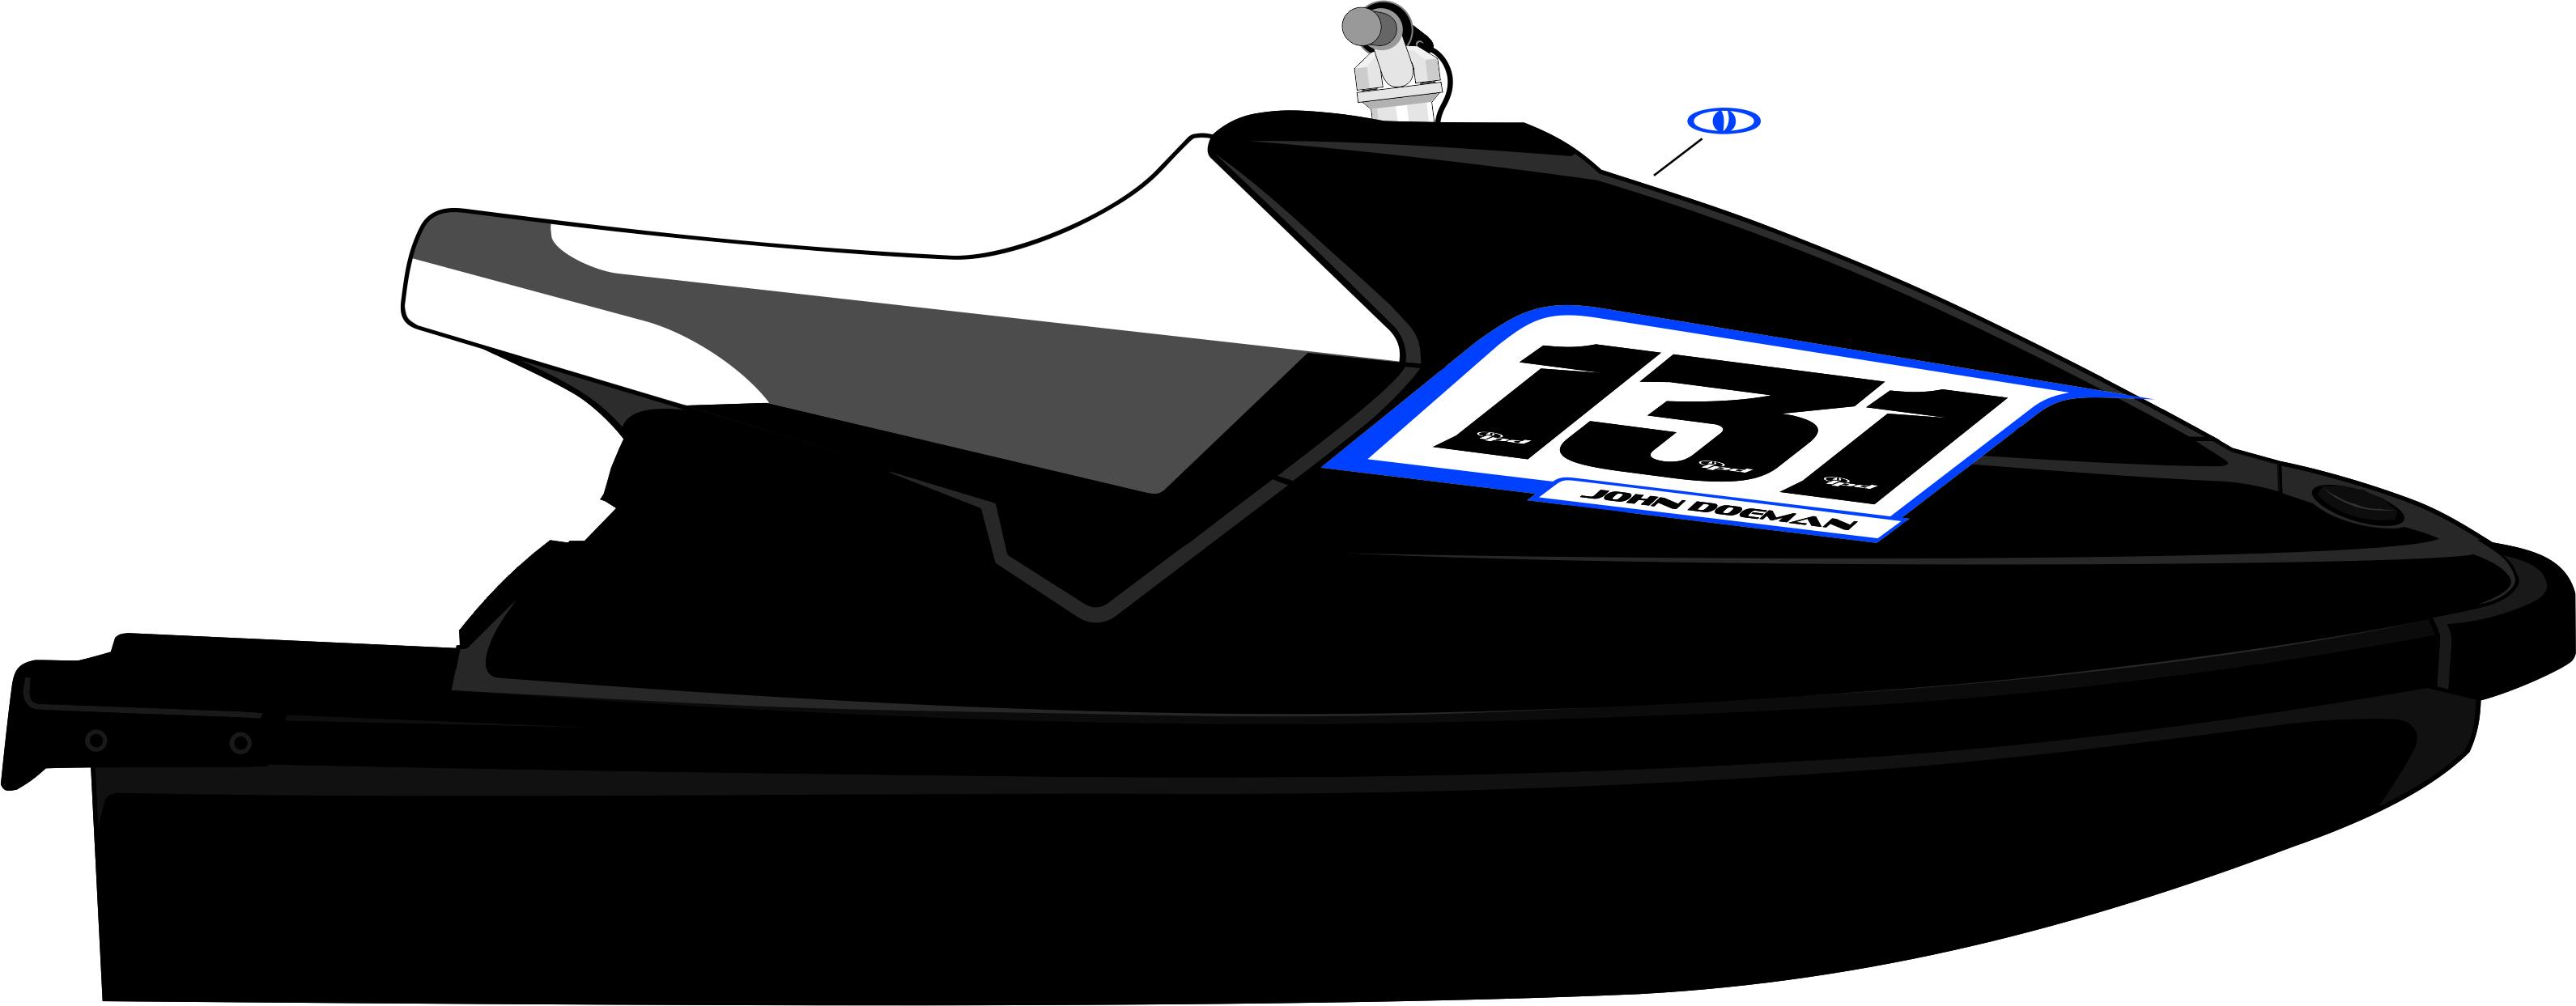 Yamaha waveblaster number plate kit x4 design ipd jet for Yamaha sports plaza promo code